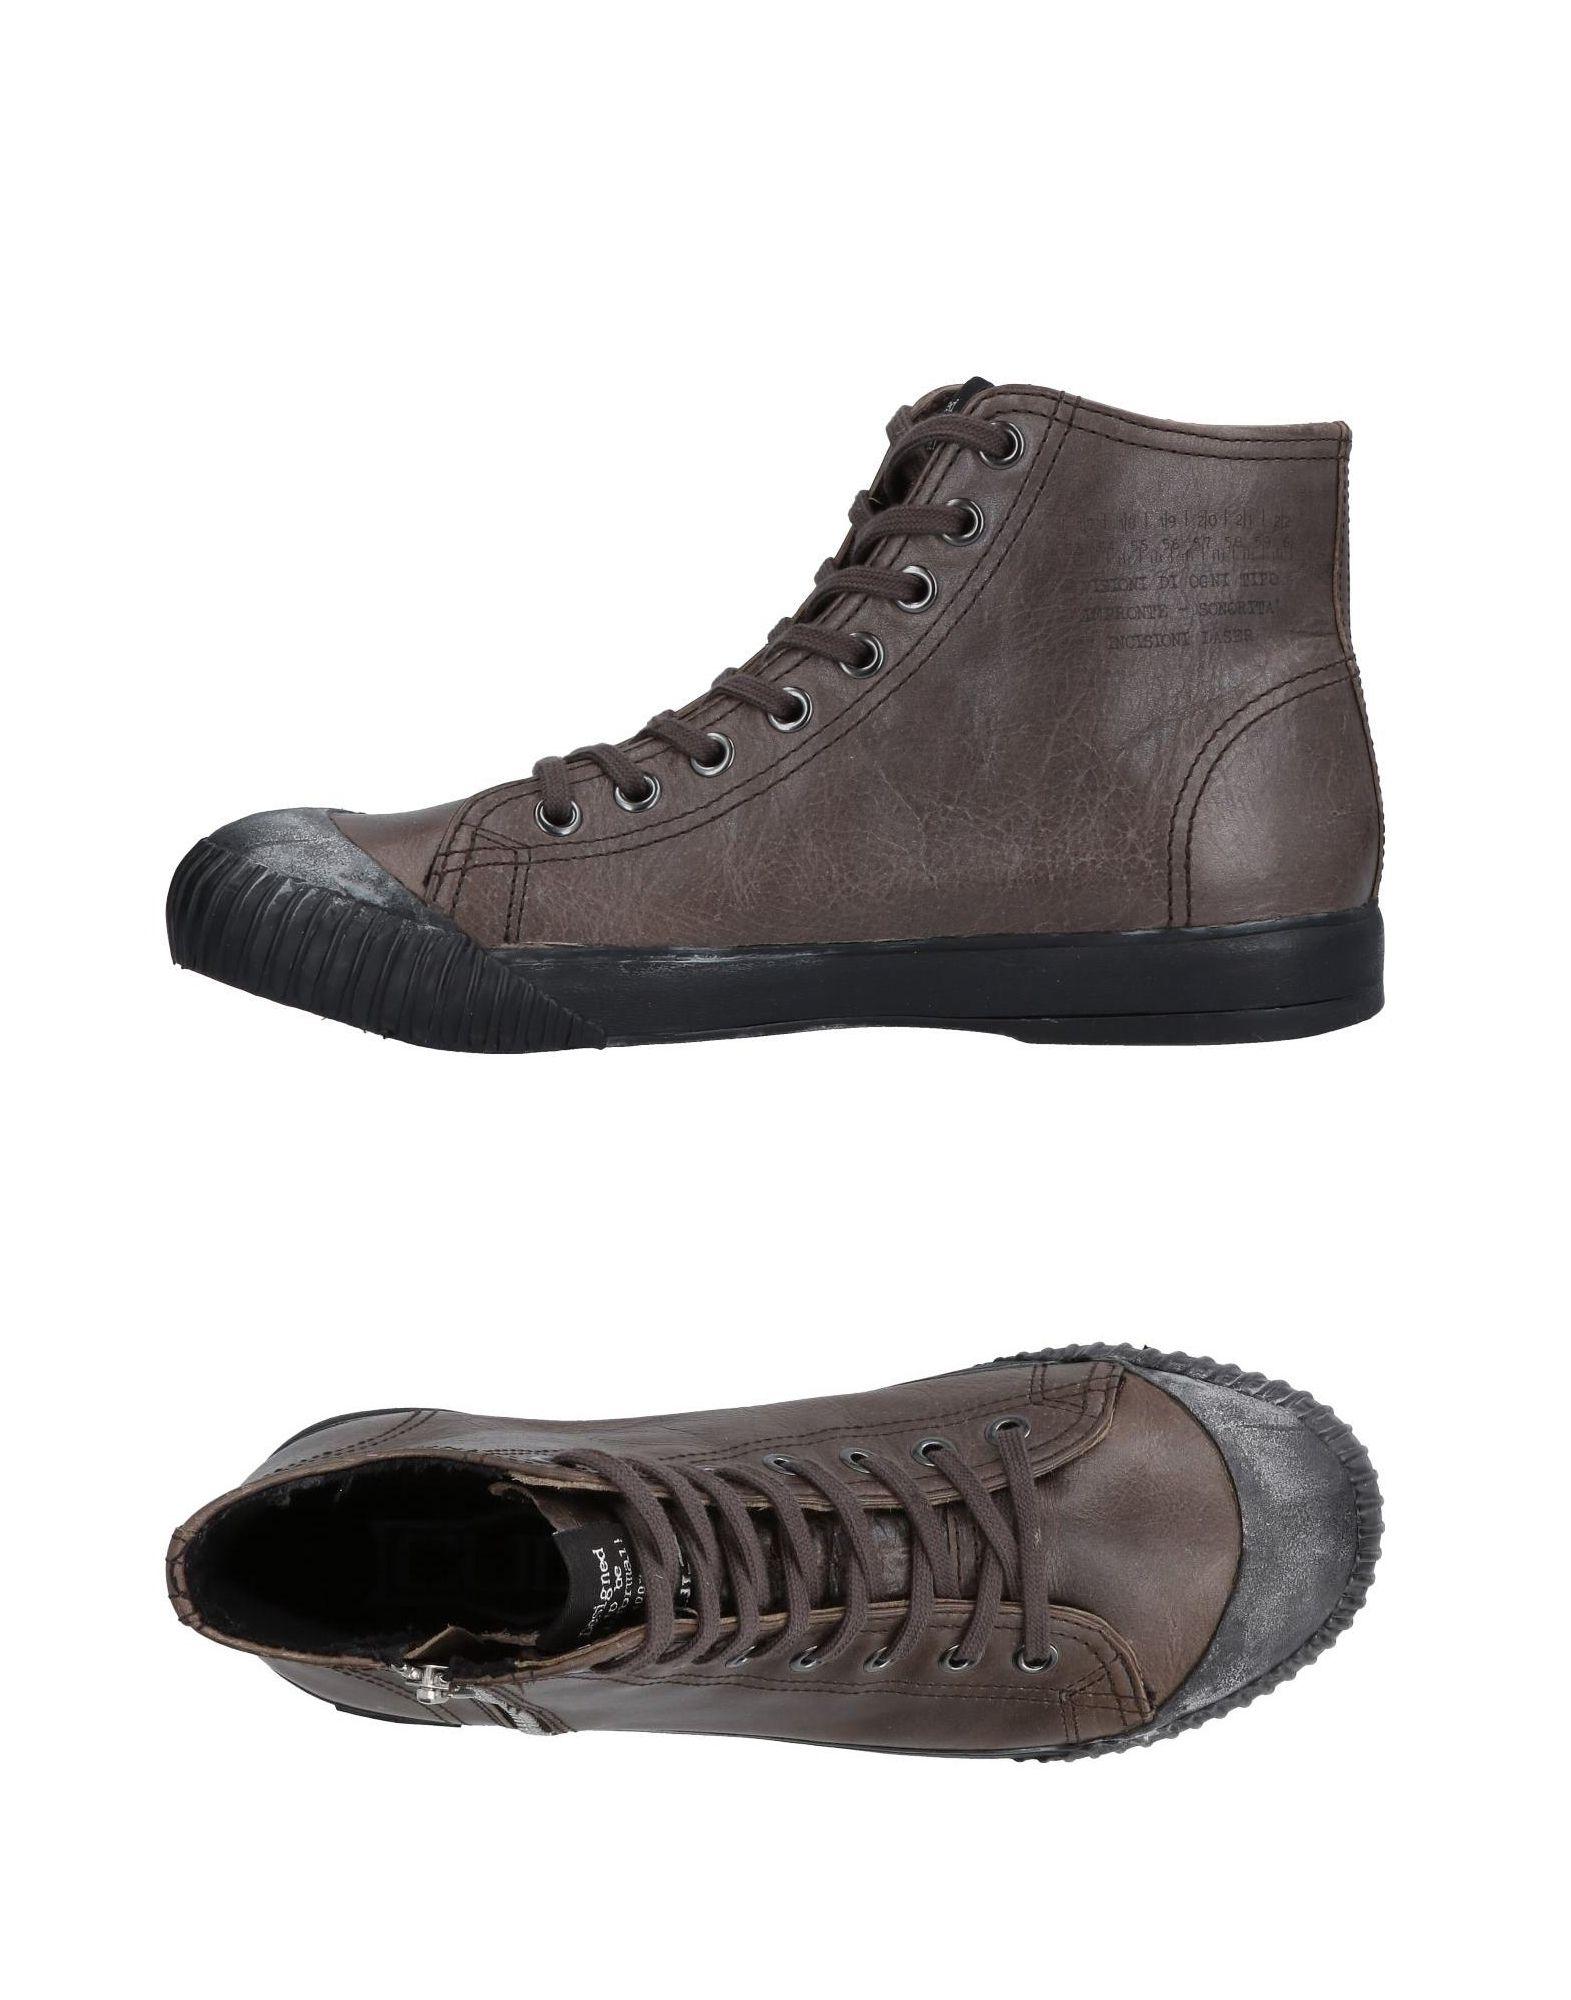 CULT Высокие кеды и кроссовки кеды кроссовки высокие dc council mid tx stone camo